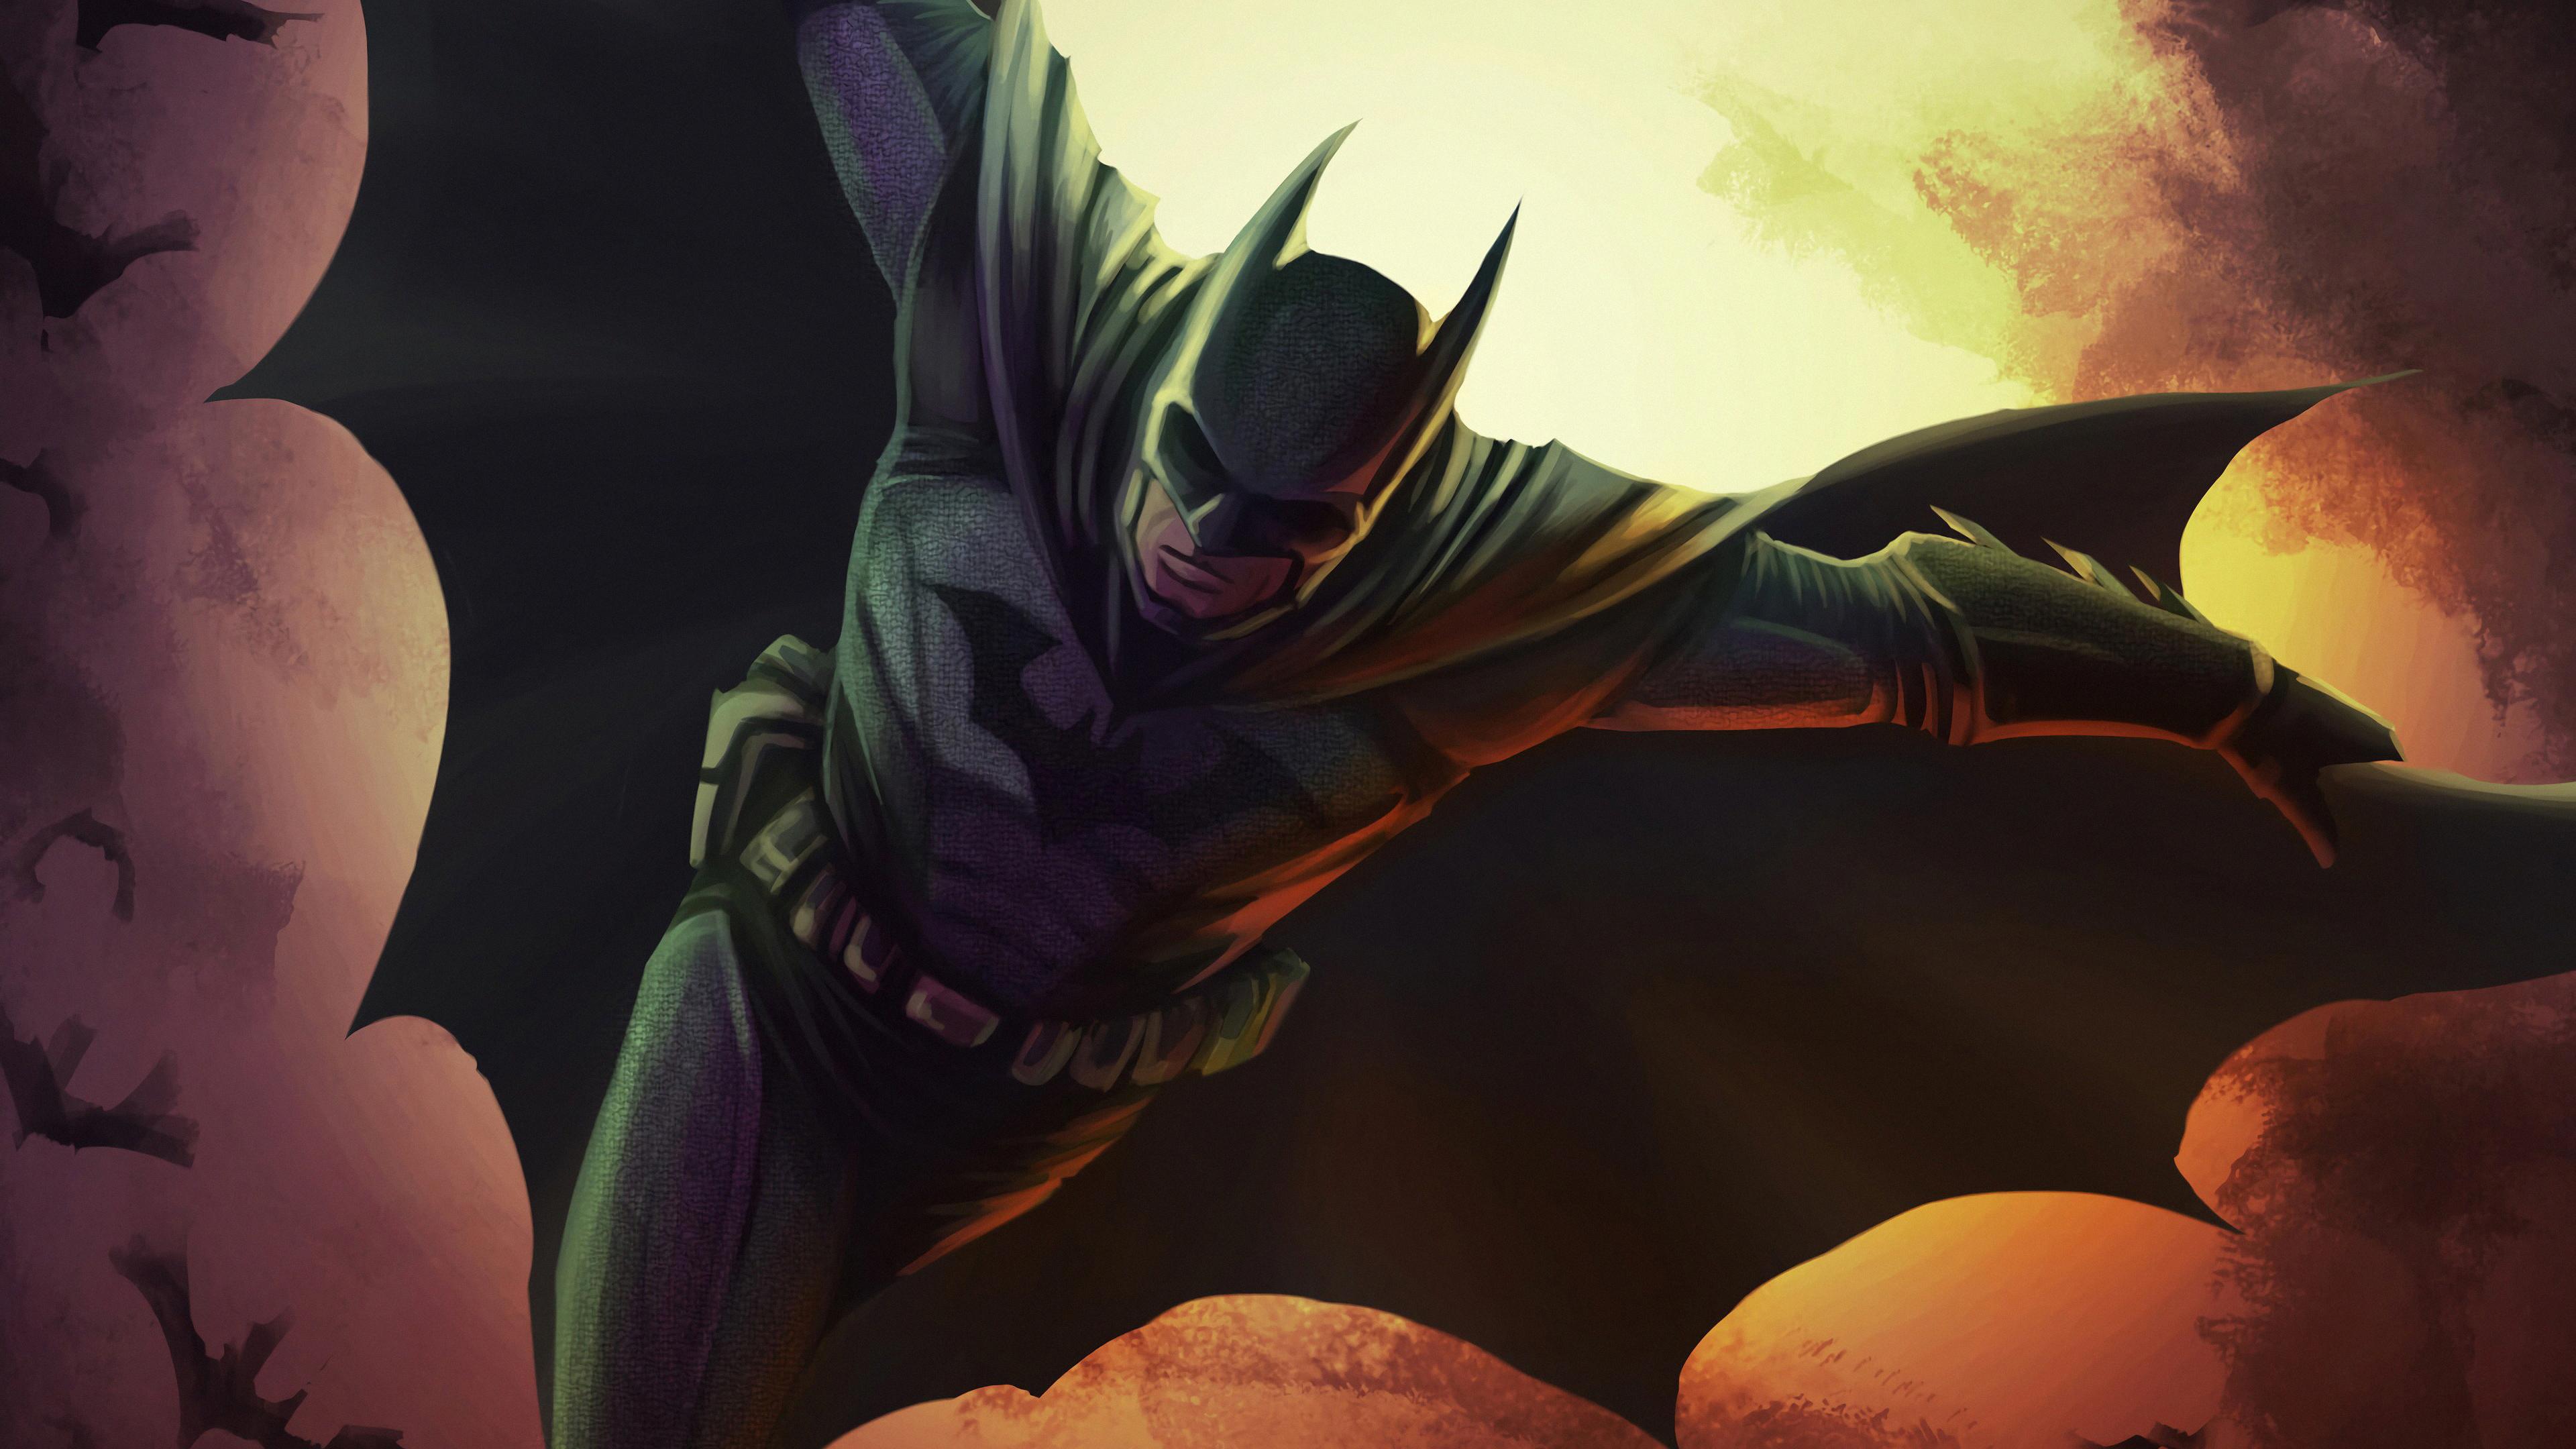 batman cape flying 1569186954 - Batman Cape Flying - superheroes wallpapers, portrait wallpapers, hd-wallpapers, batman wallpapers, artwork wallpapers, 4k-wallpapers